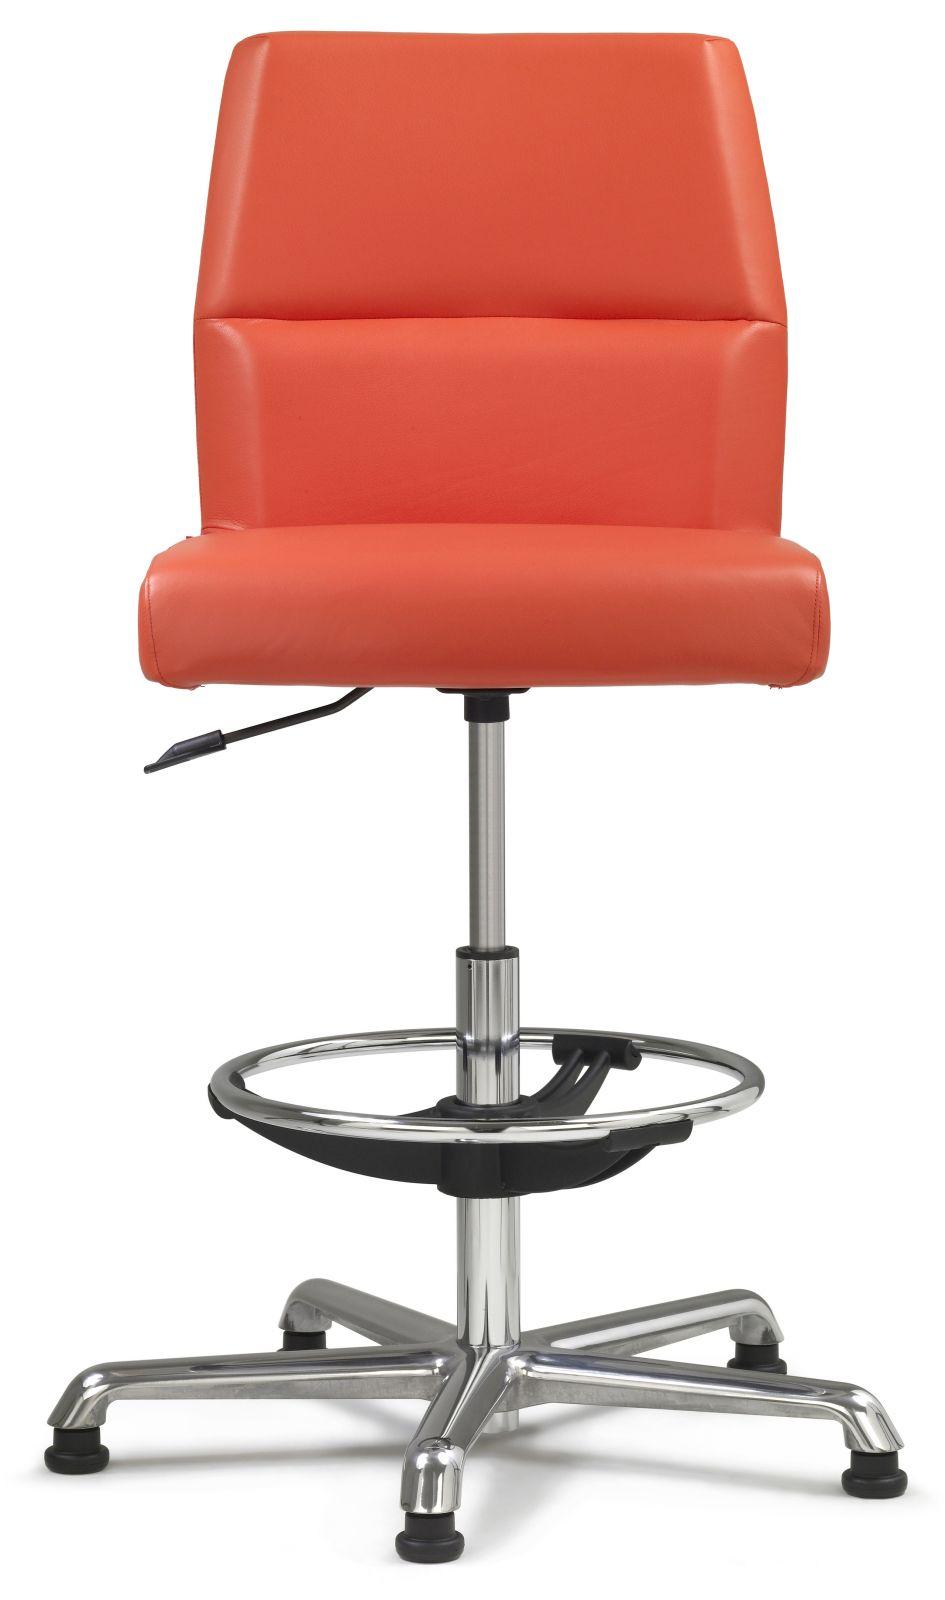 modern-bar-stools-Italian-furniture-large (8).jpg